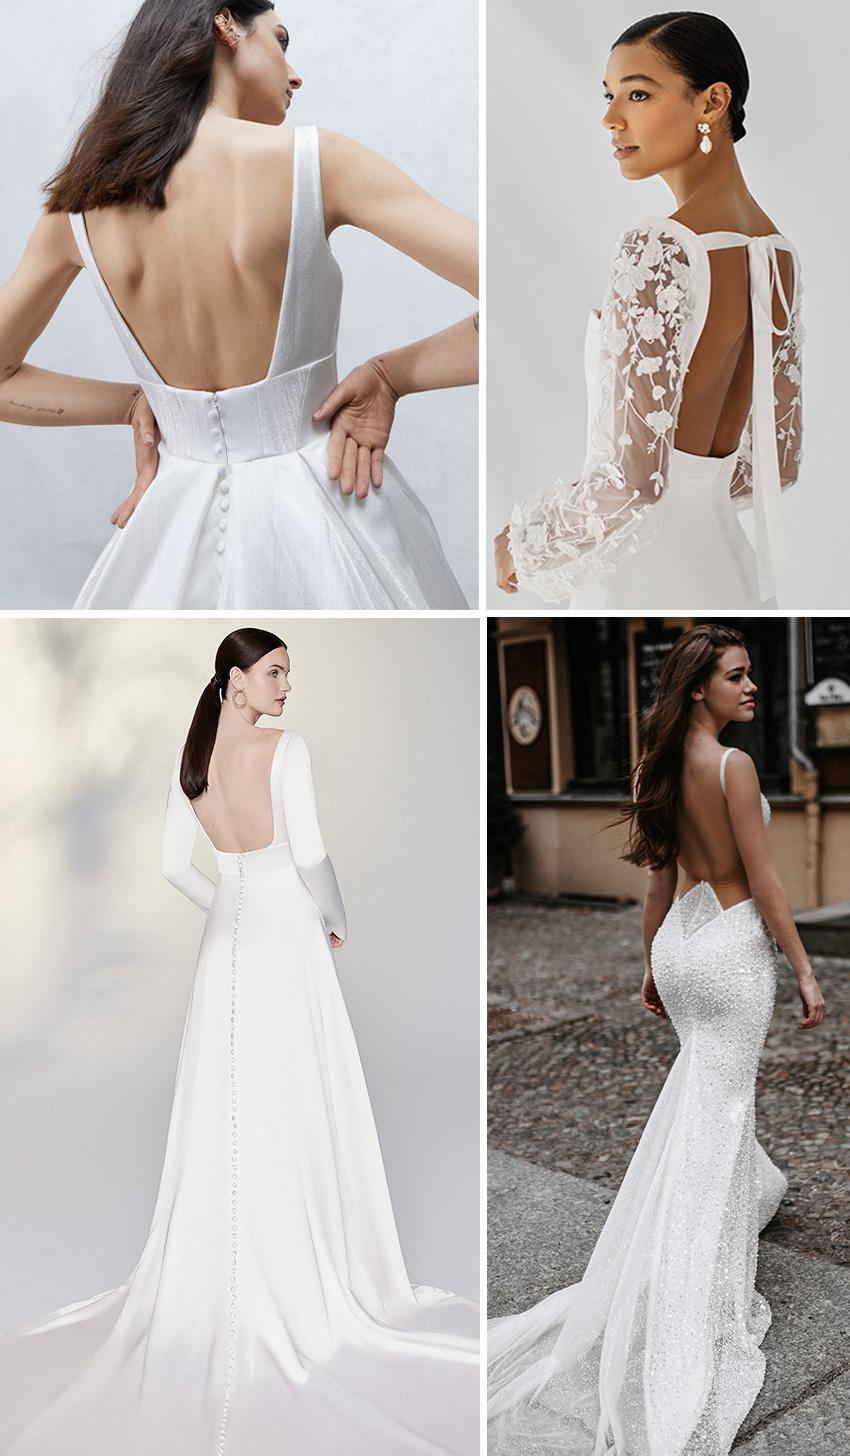 2022 bridal trends from NY Luxury Bridal Fashion Week